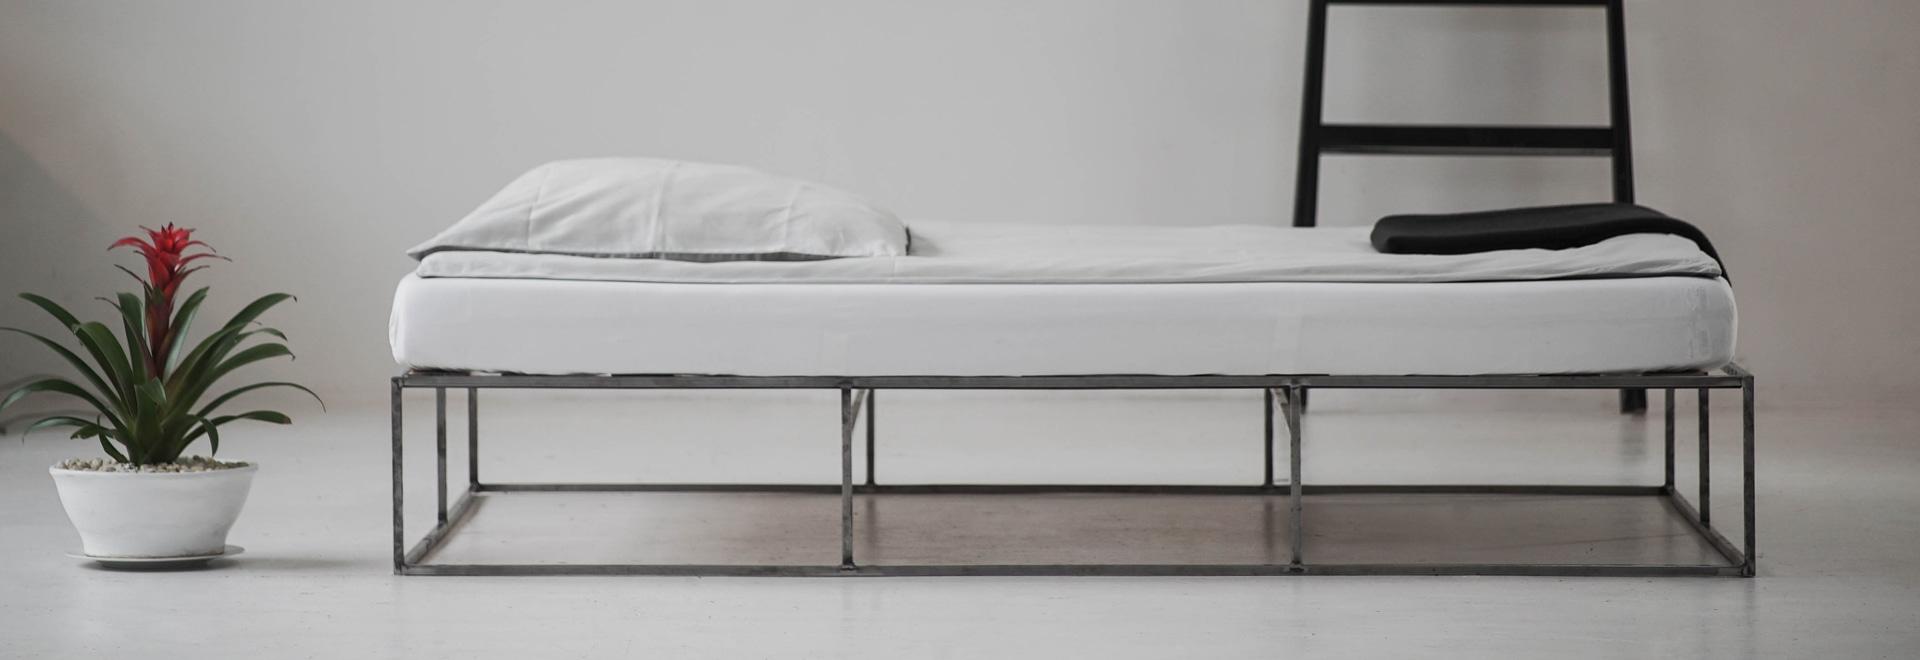 Great Industrial Design Meets Minimalisim In The Urban Bedroom